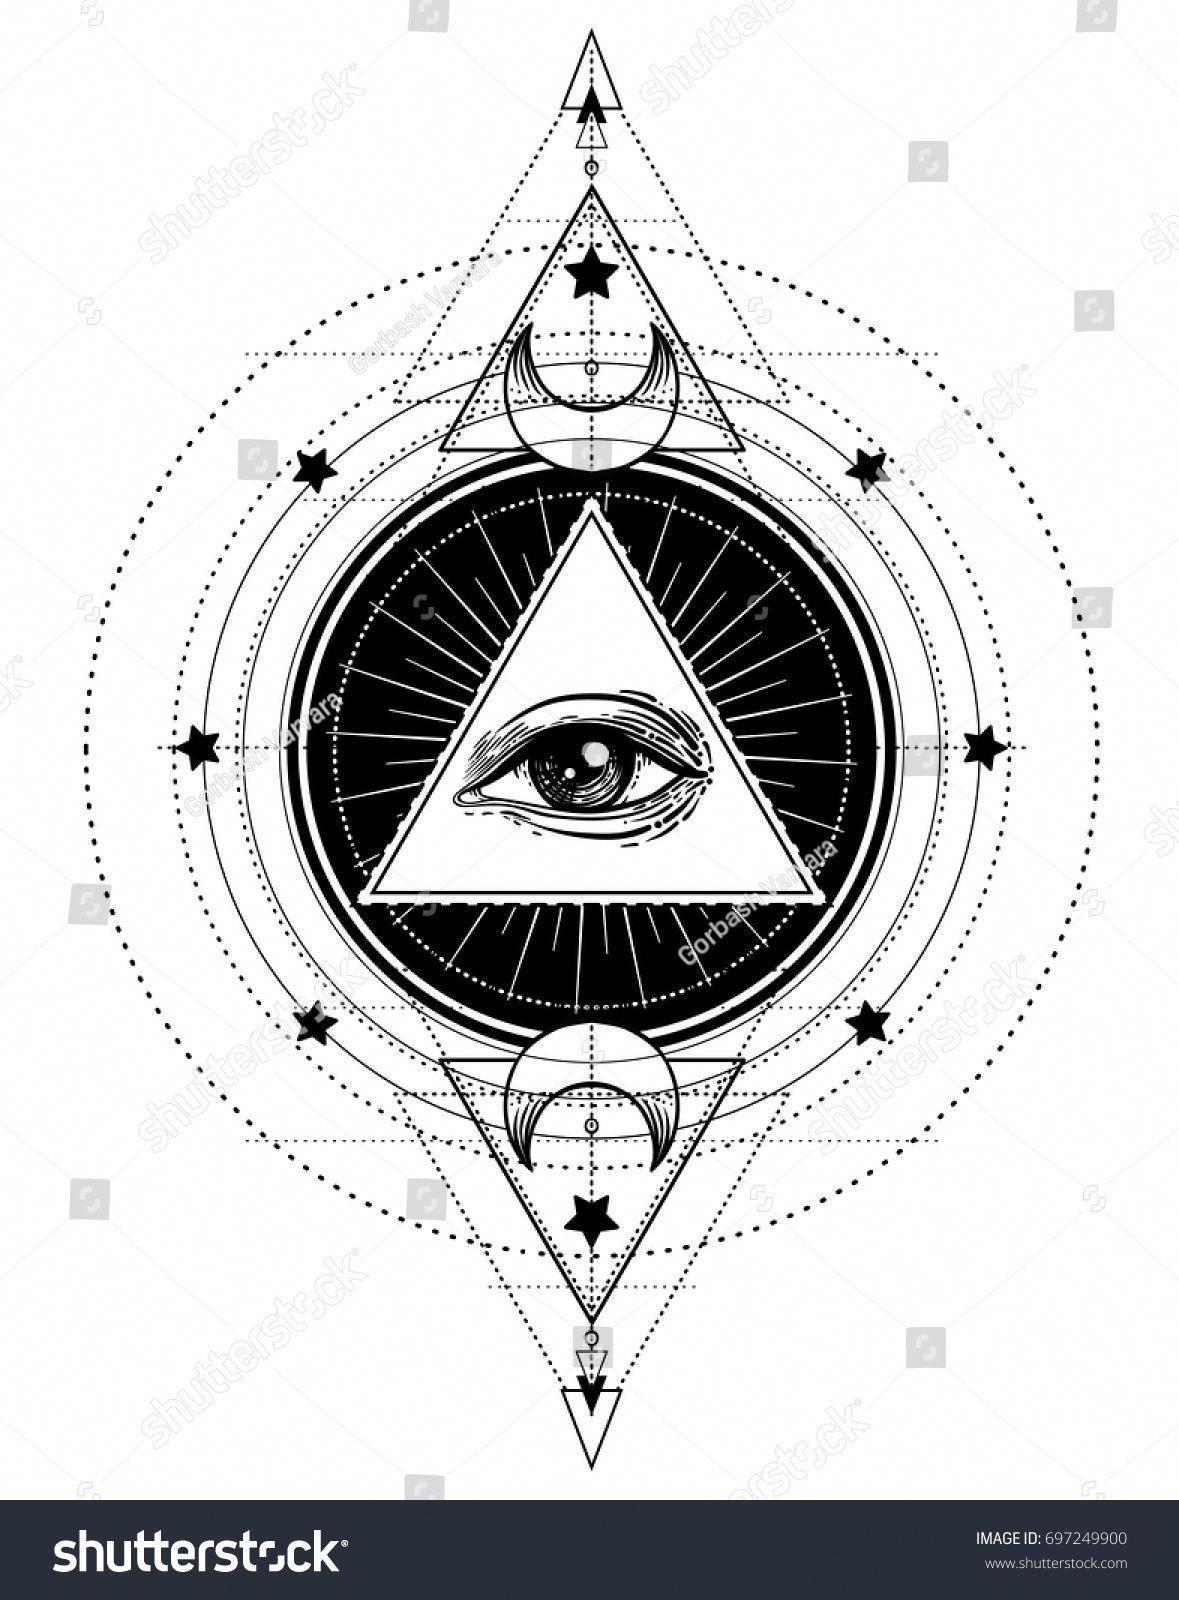 Pin by Sloan Barclay on Craft Eye tattoo, Third eye tattoos